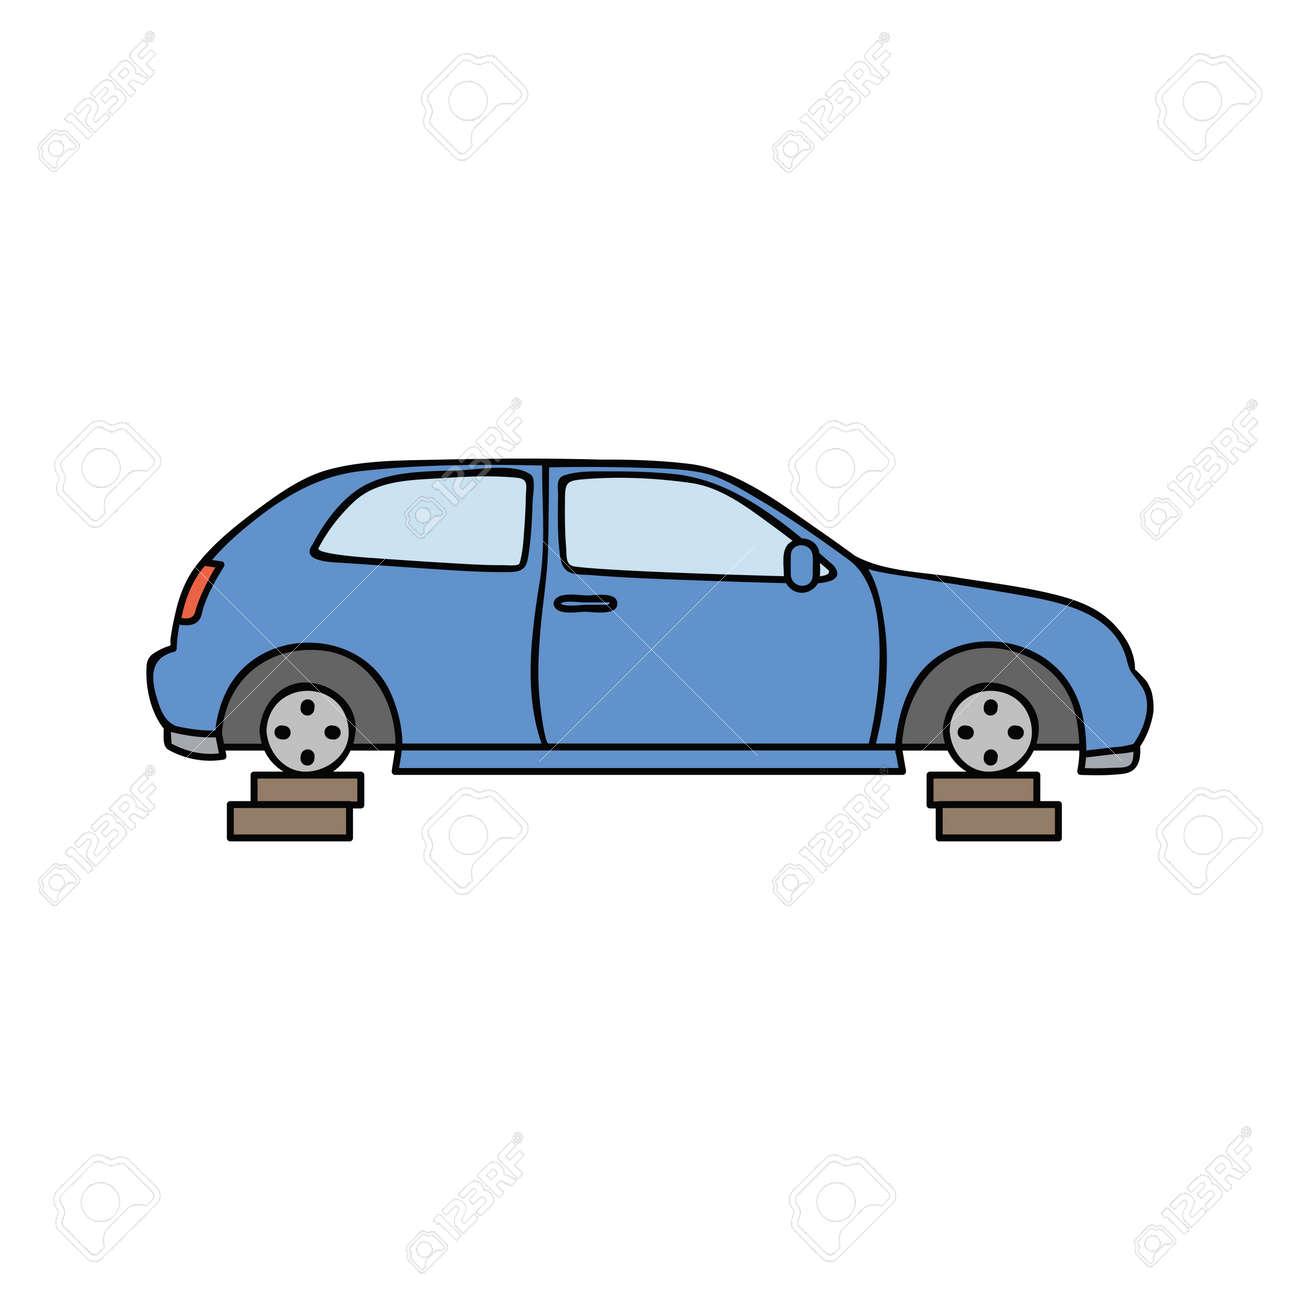 blue broken car scrap metal vector illustration - 171583125